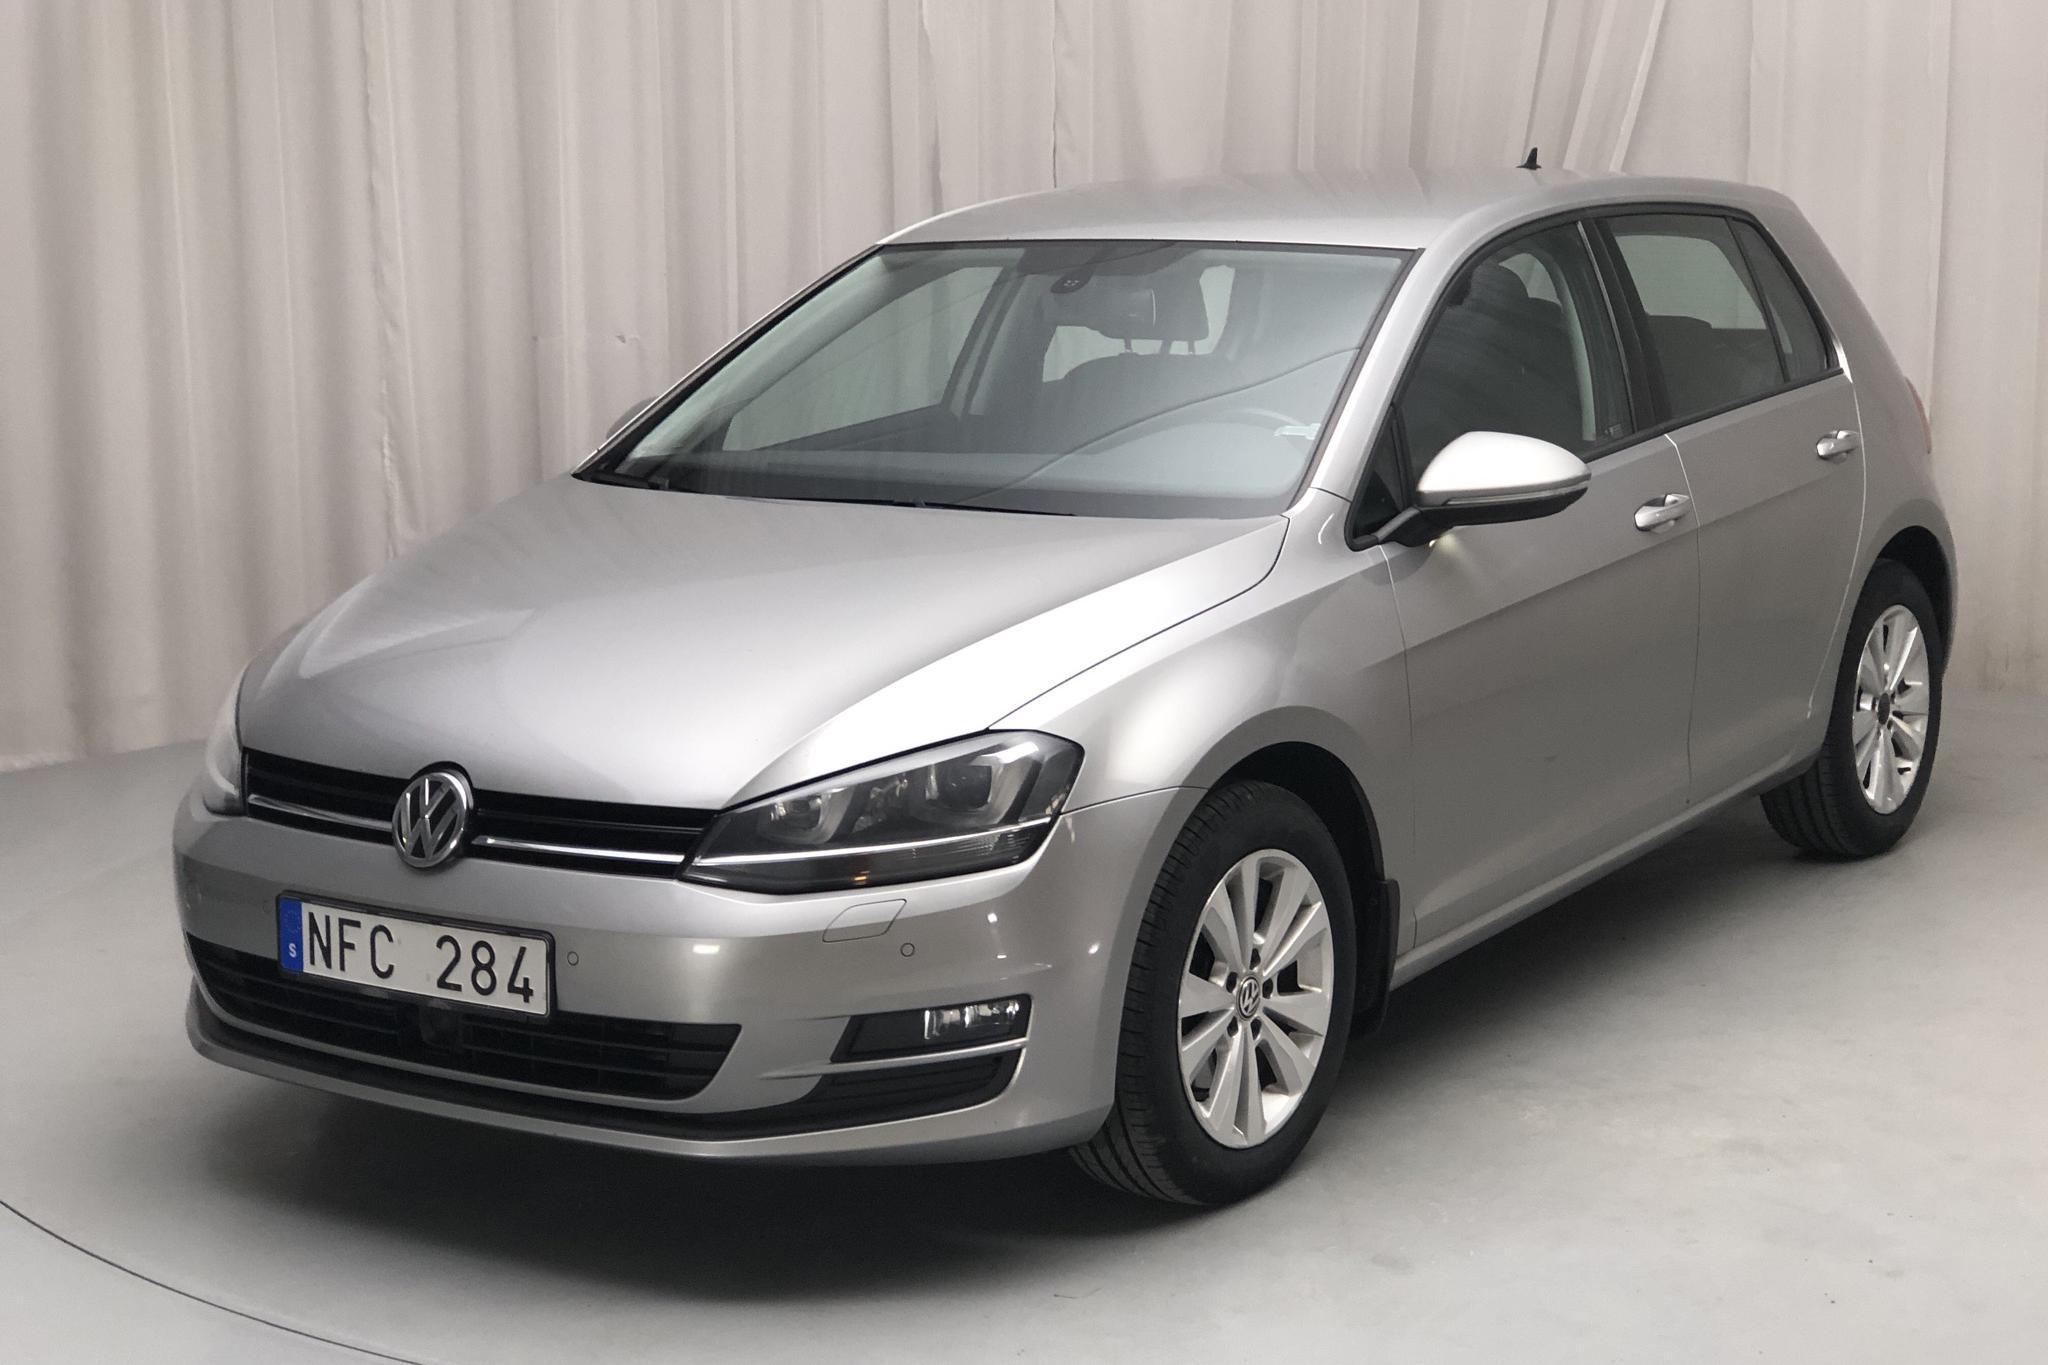 VW Golf VII 1.6 TDI BlueMotion Technology 5dr (105hk) - 25 236 mil - Manuell - silver - 2013